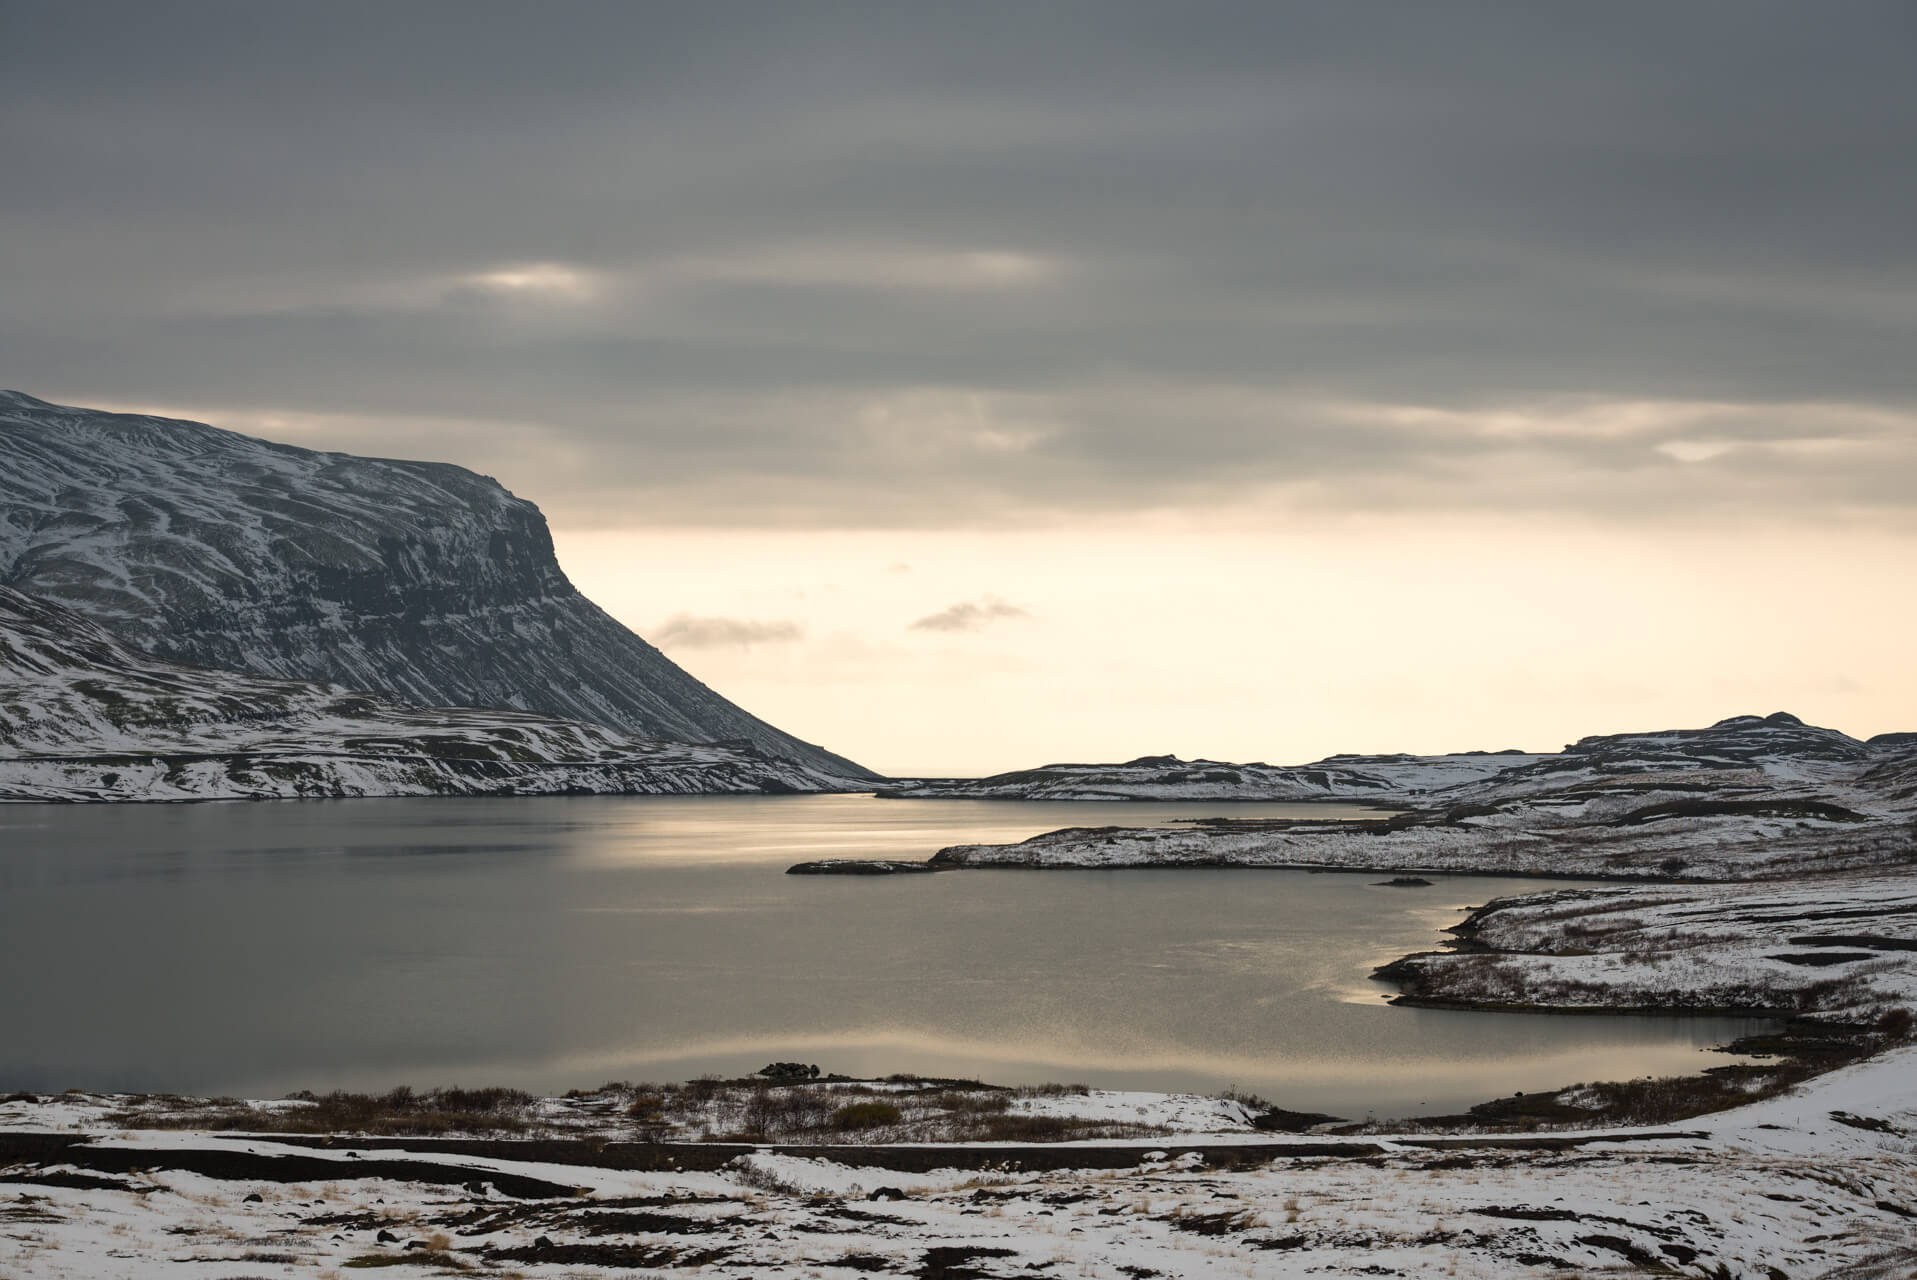 Island, Búrfell; Fotograf Steffen Lohse